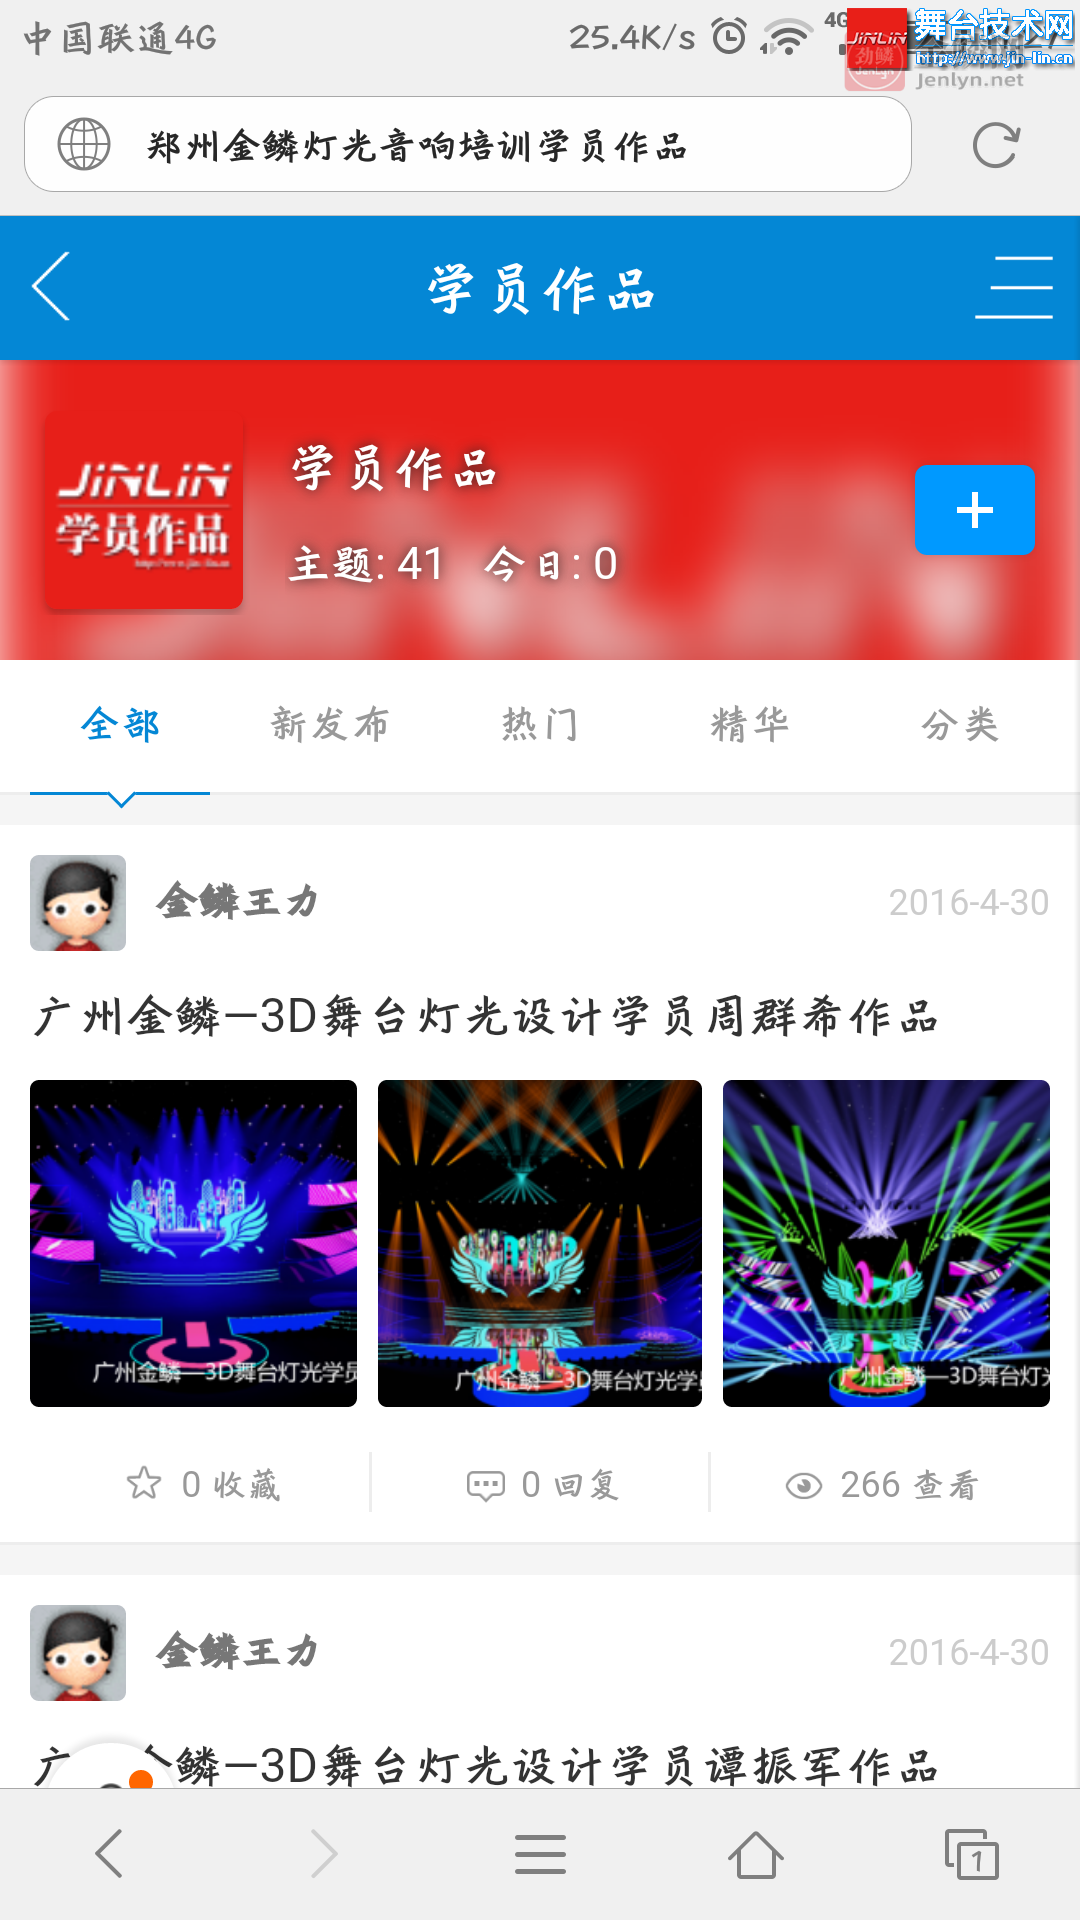 Screenshot_2016-09-09-11-27-01.png